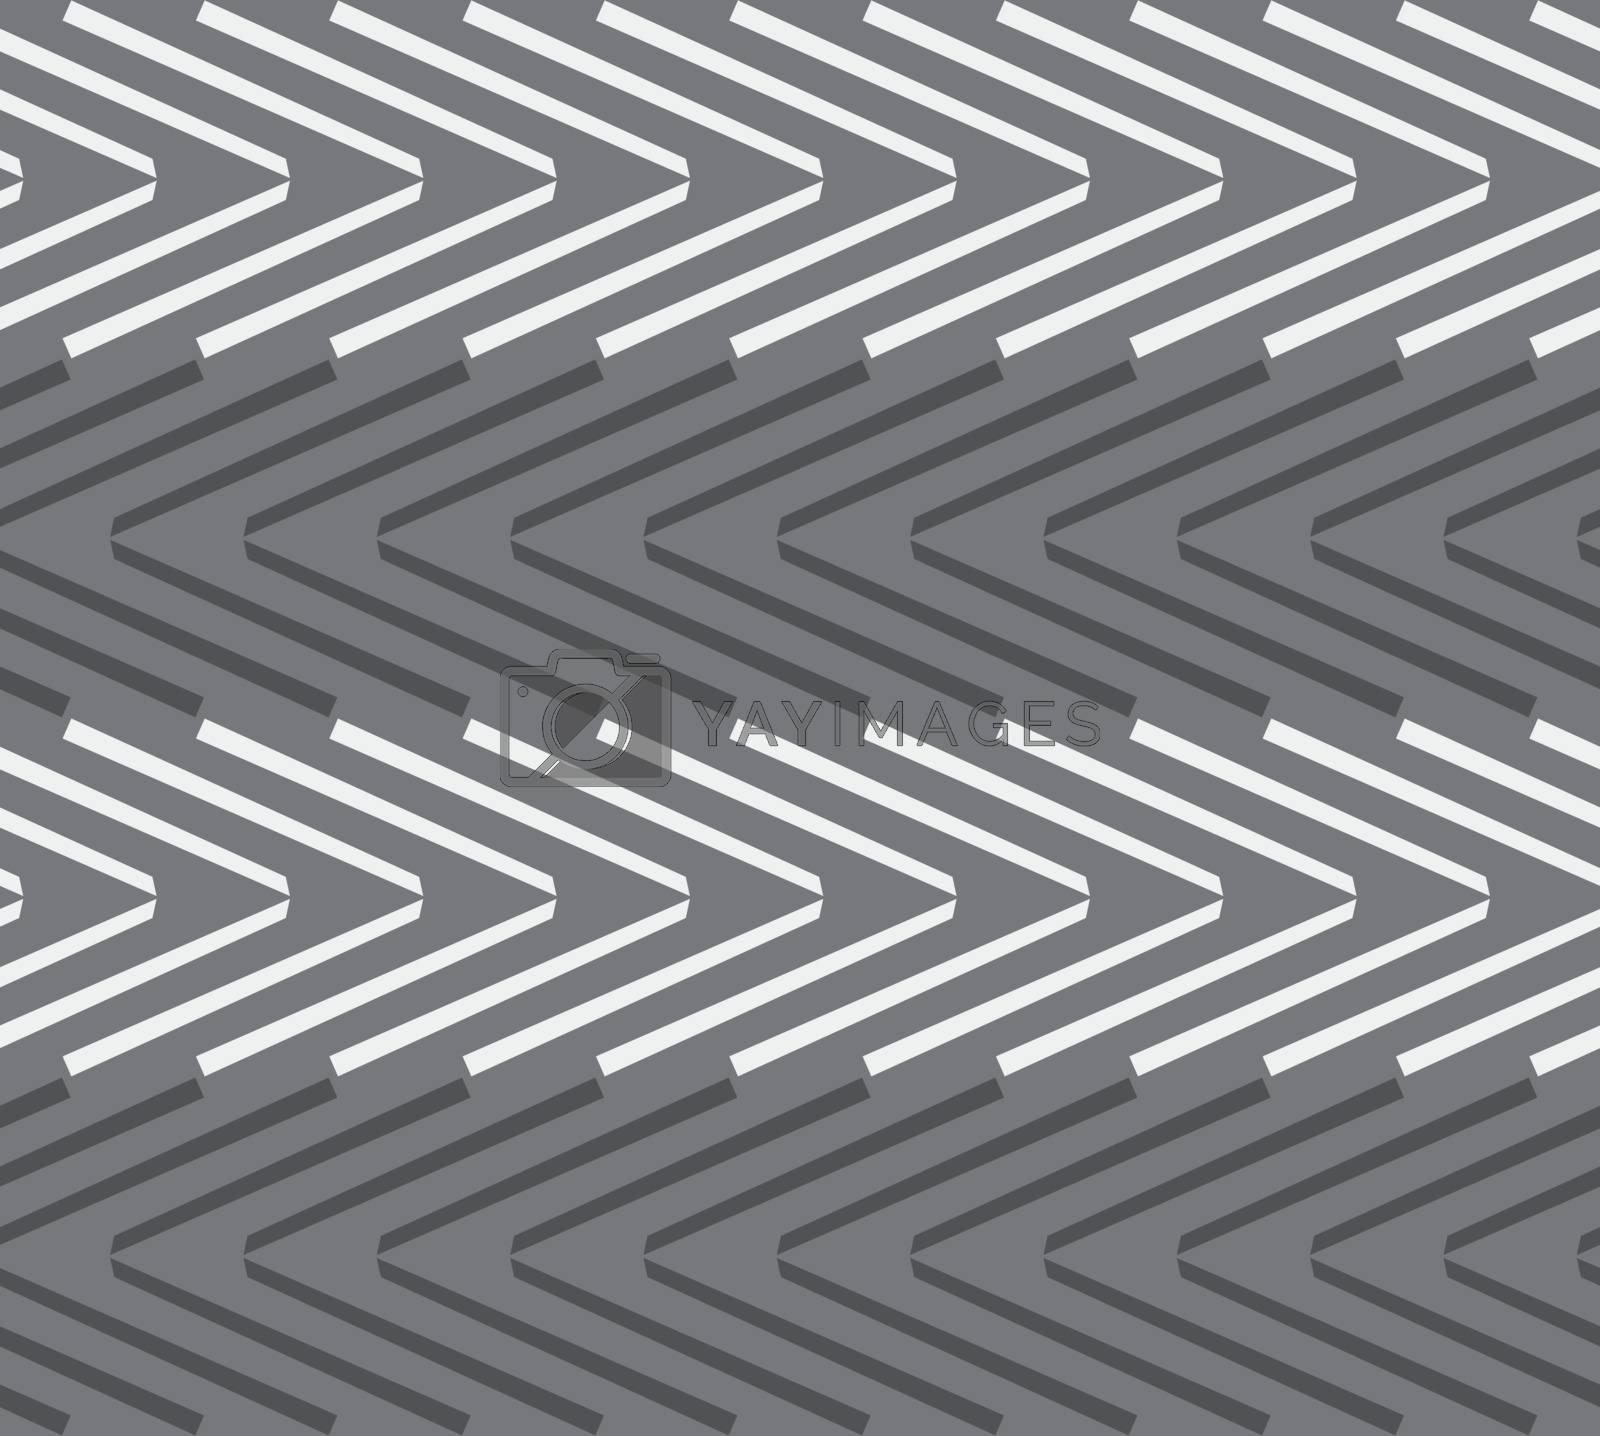 Seamless stylish geometric background. Modern abstract pattern. Flat monochrome design.Monochrome pattern with black and white chevrons.